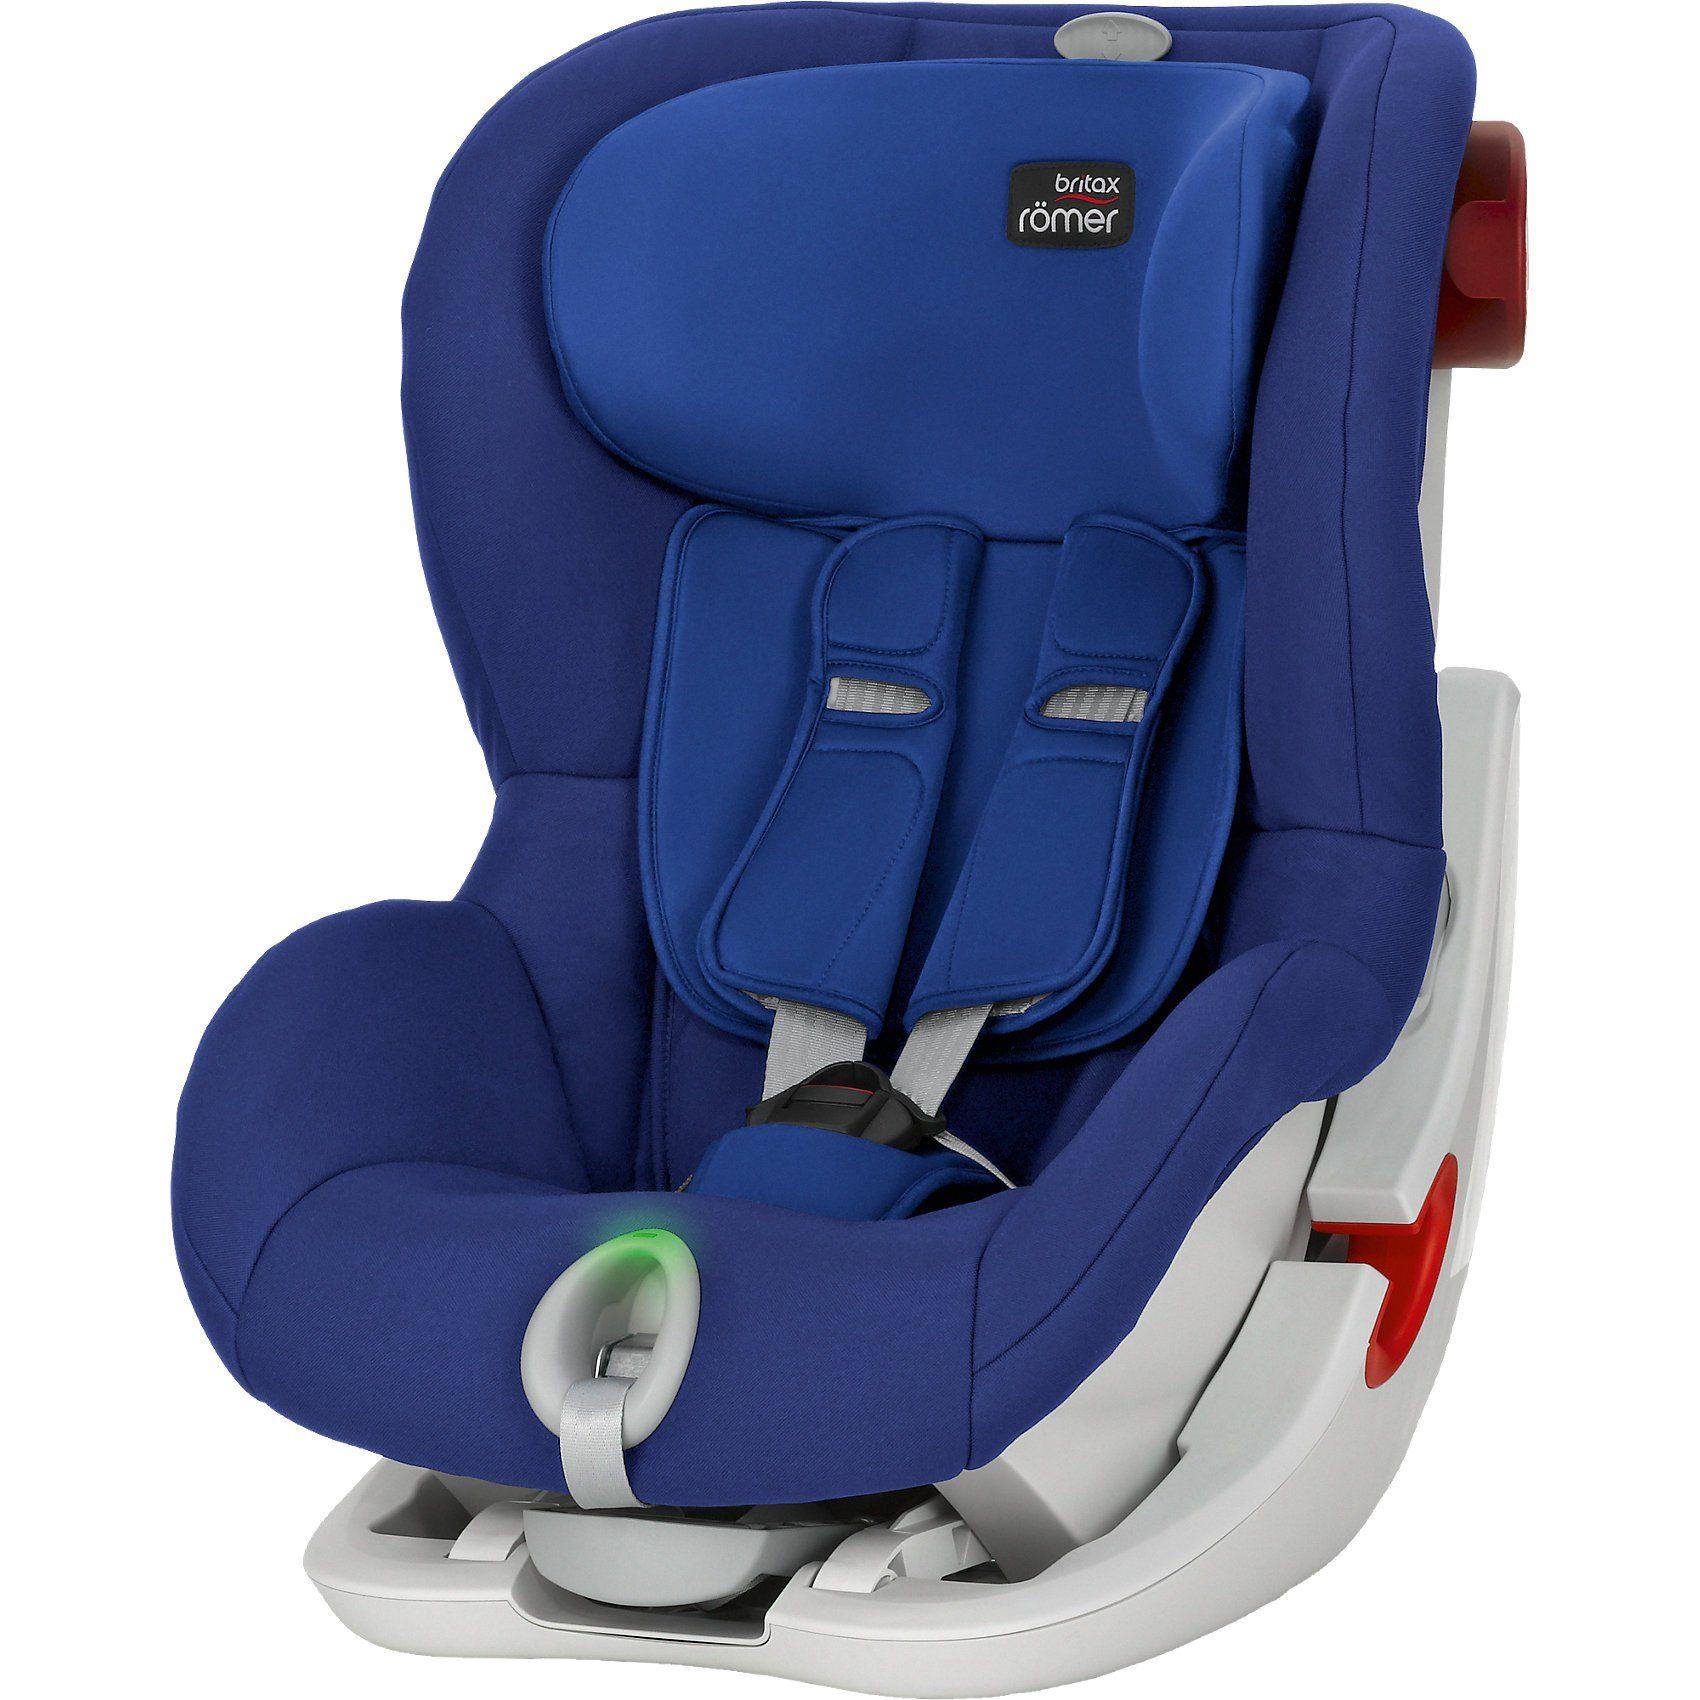 Britax Römer Auto-Kindersitz King II LS, Ocean Blue, 2016